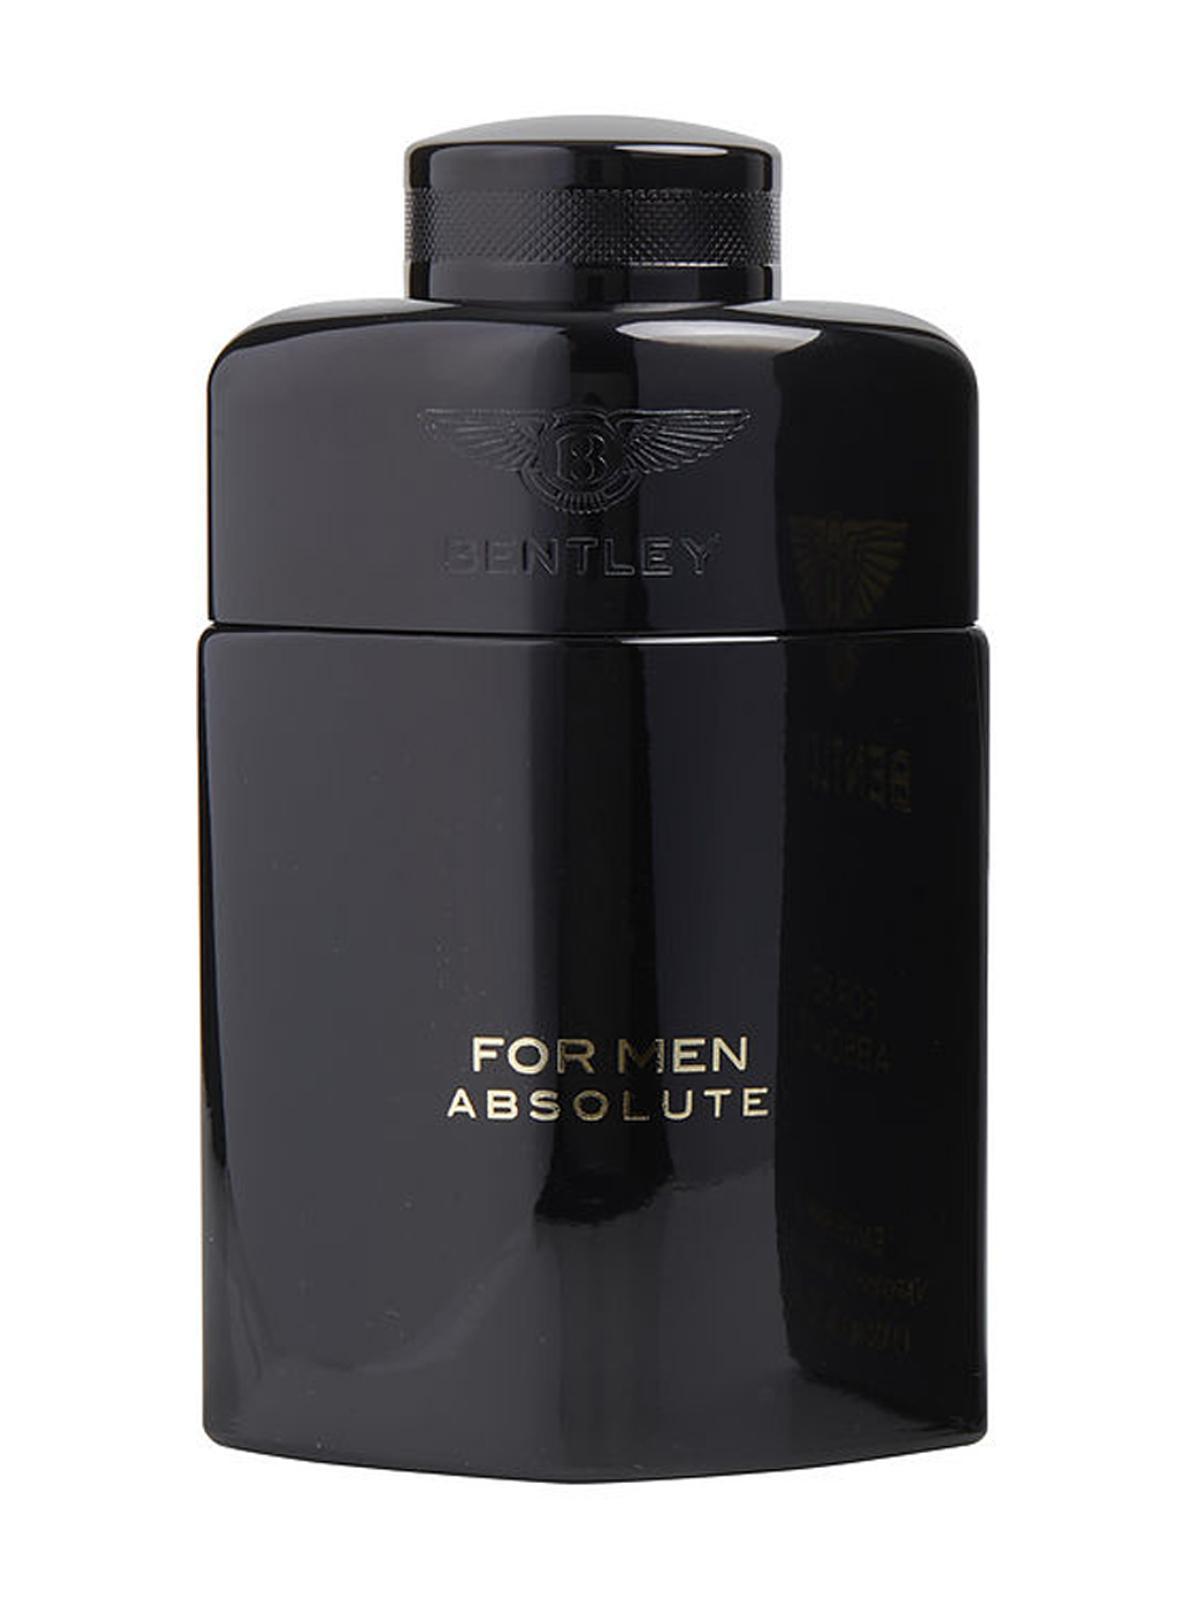 Bentley Absolute For Men Eau De Parfum 100ML